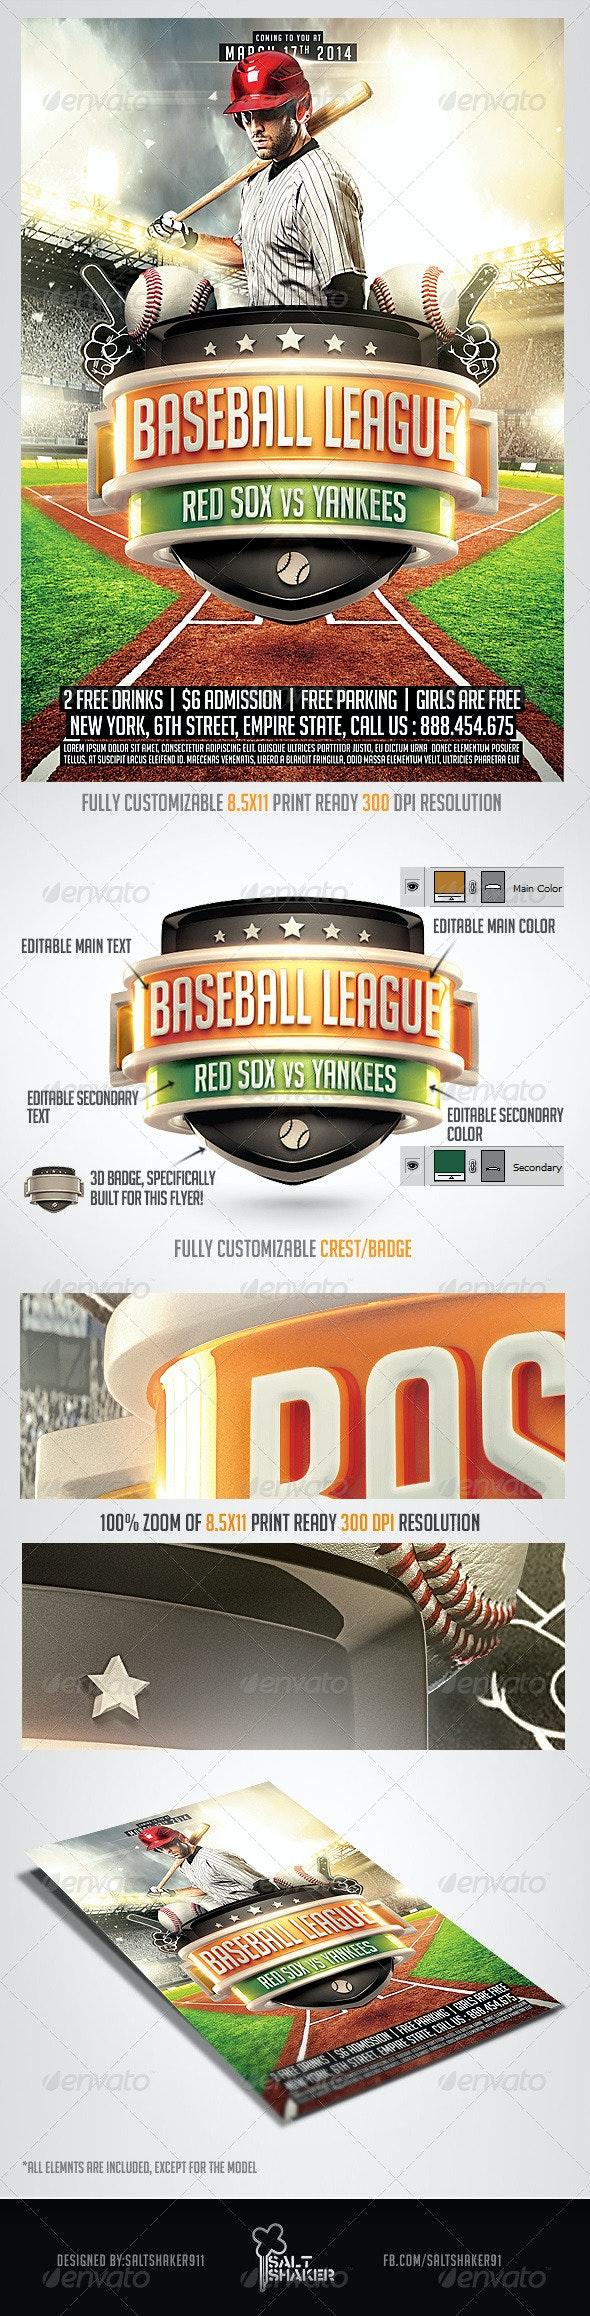 Baseball League Flyer Template - Sports Events